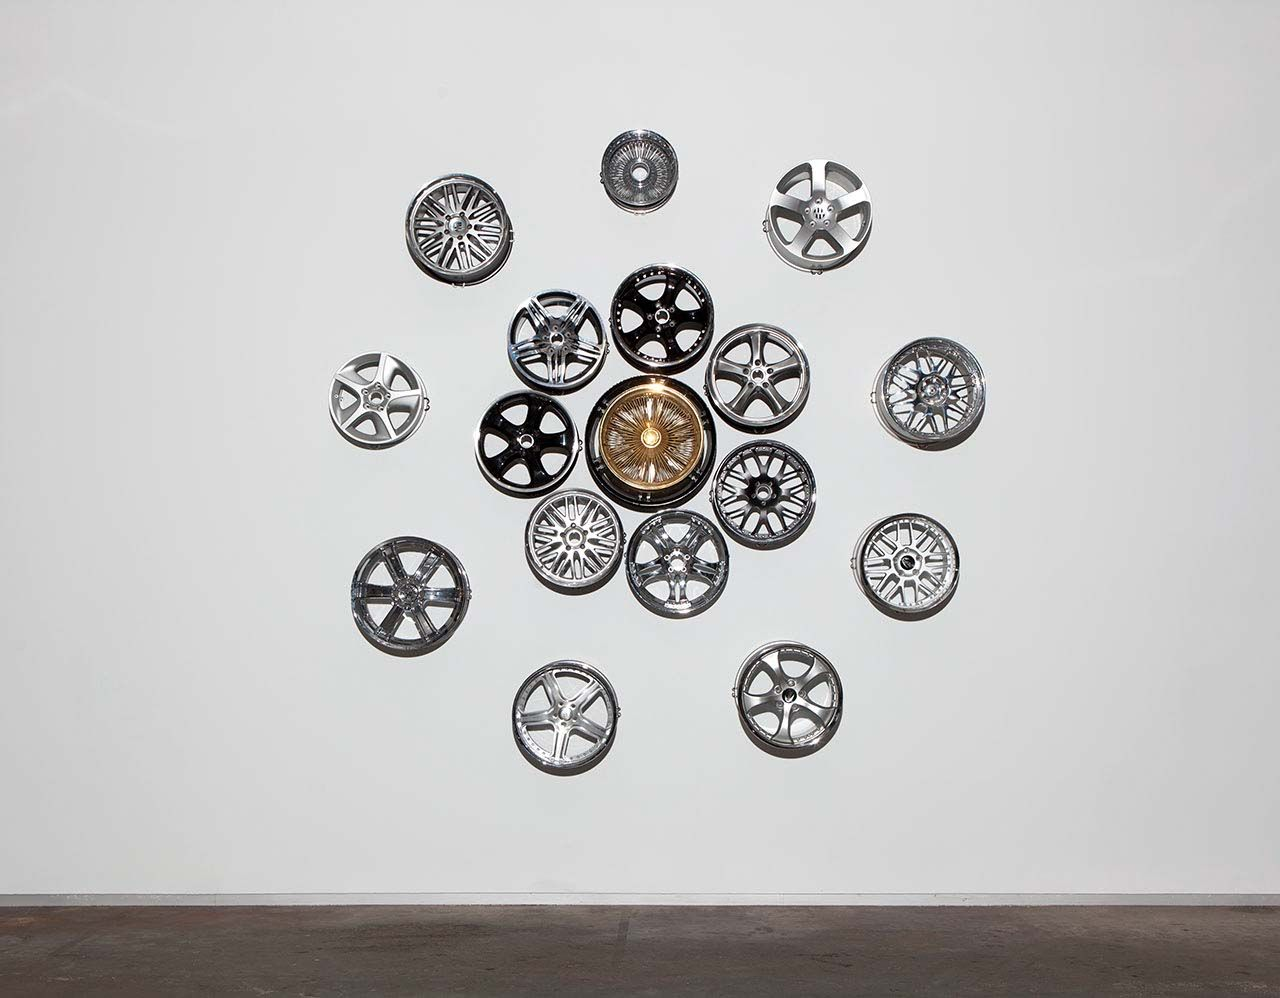 Chrome Lotus (Car Rims on Wall) - Carlos Rolón/Dzine